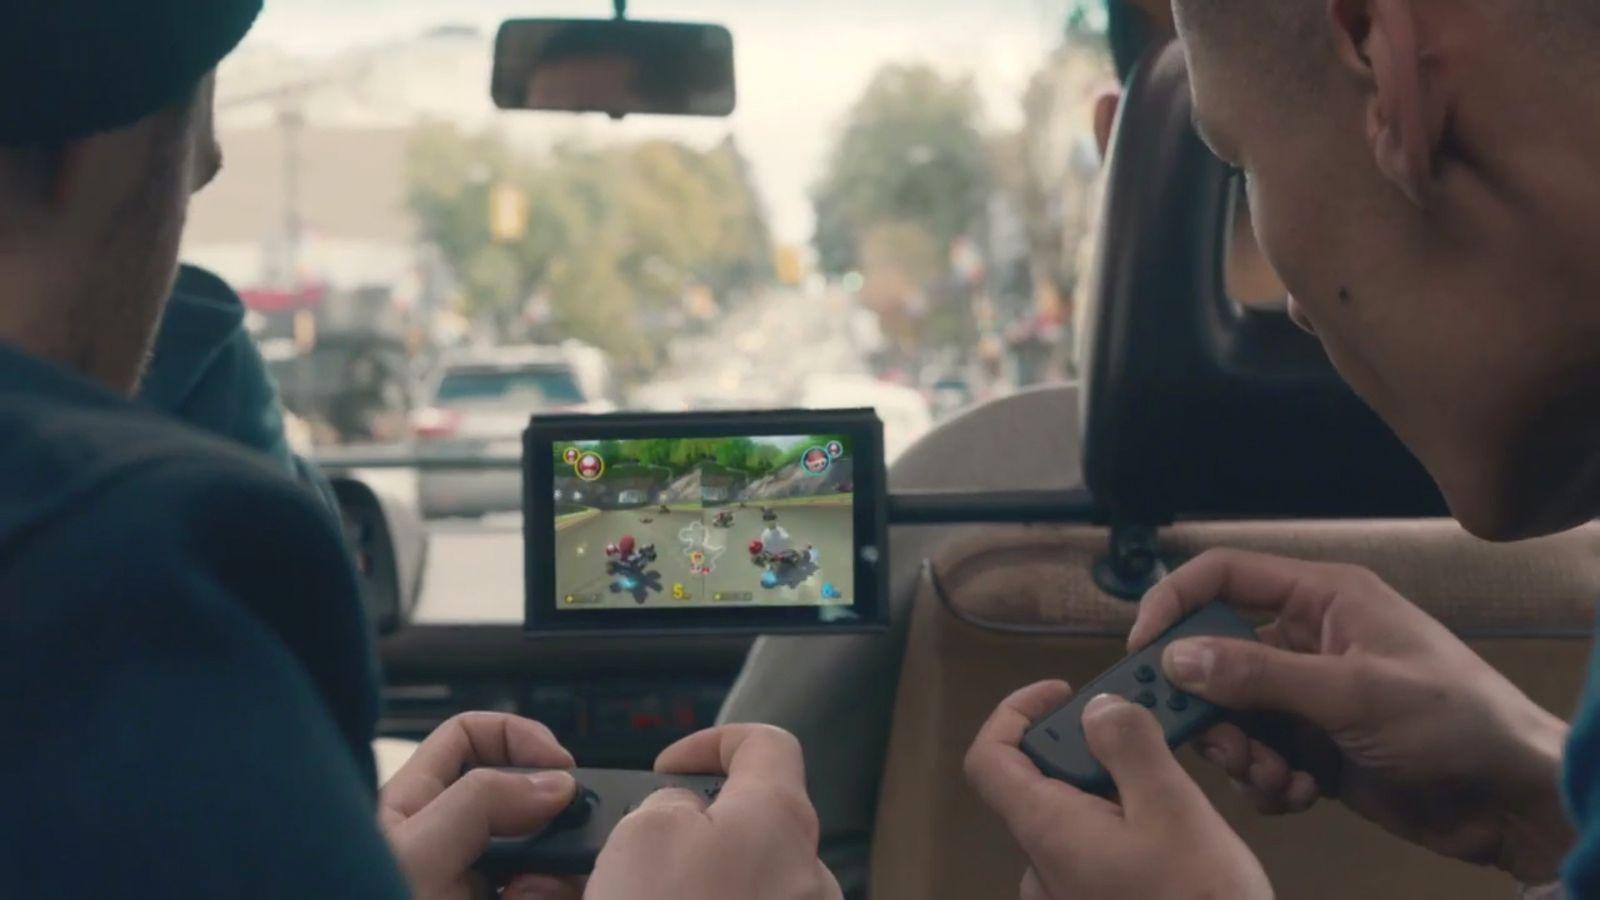 NUR ALS ZITAT Screenshot Nintendo Switch Preview Trailer